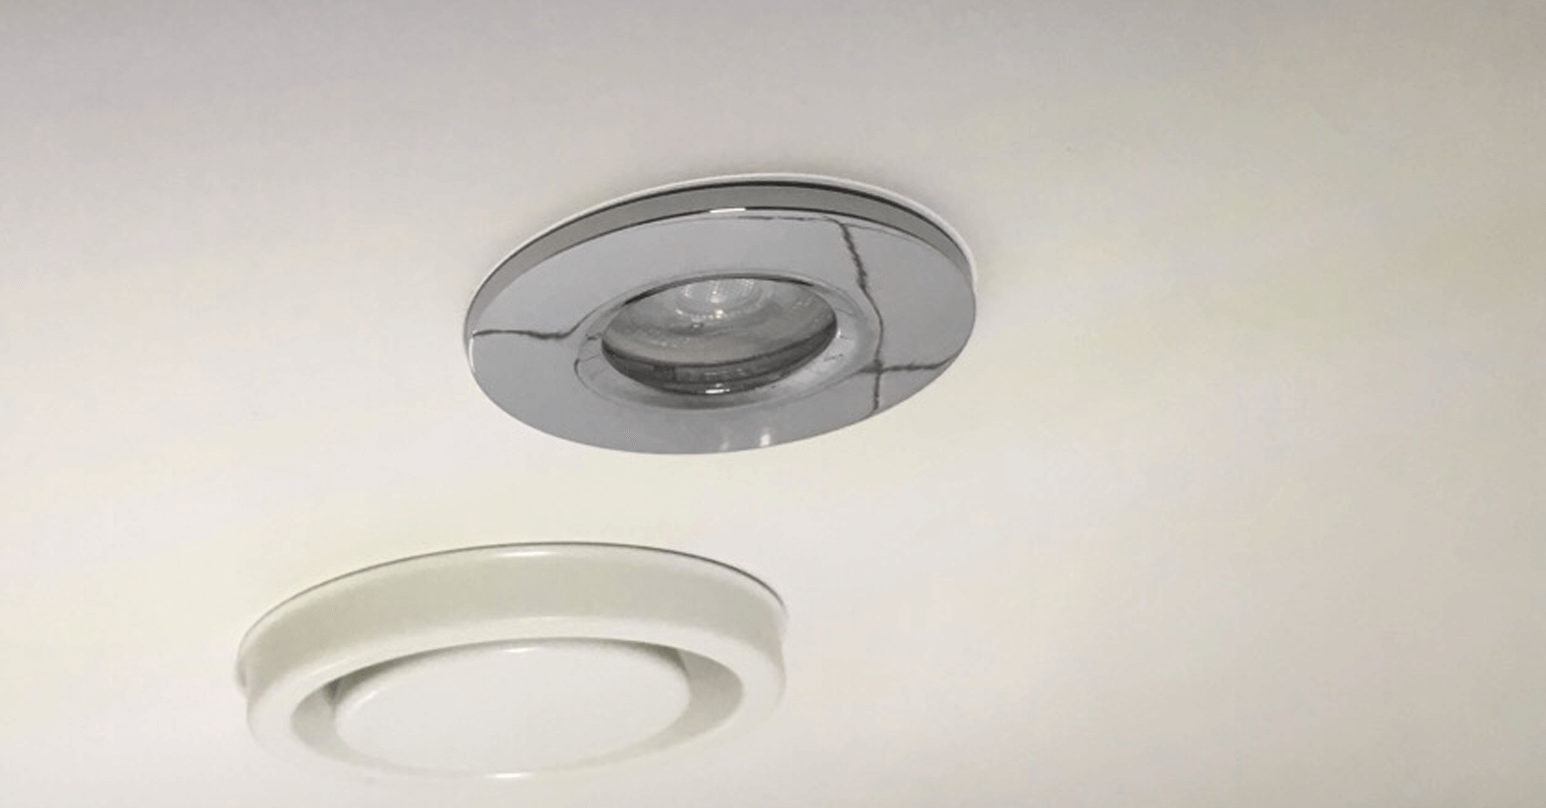 Light panel - After repair